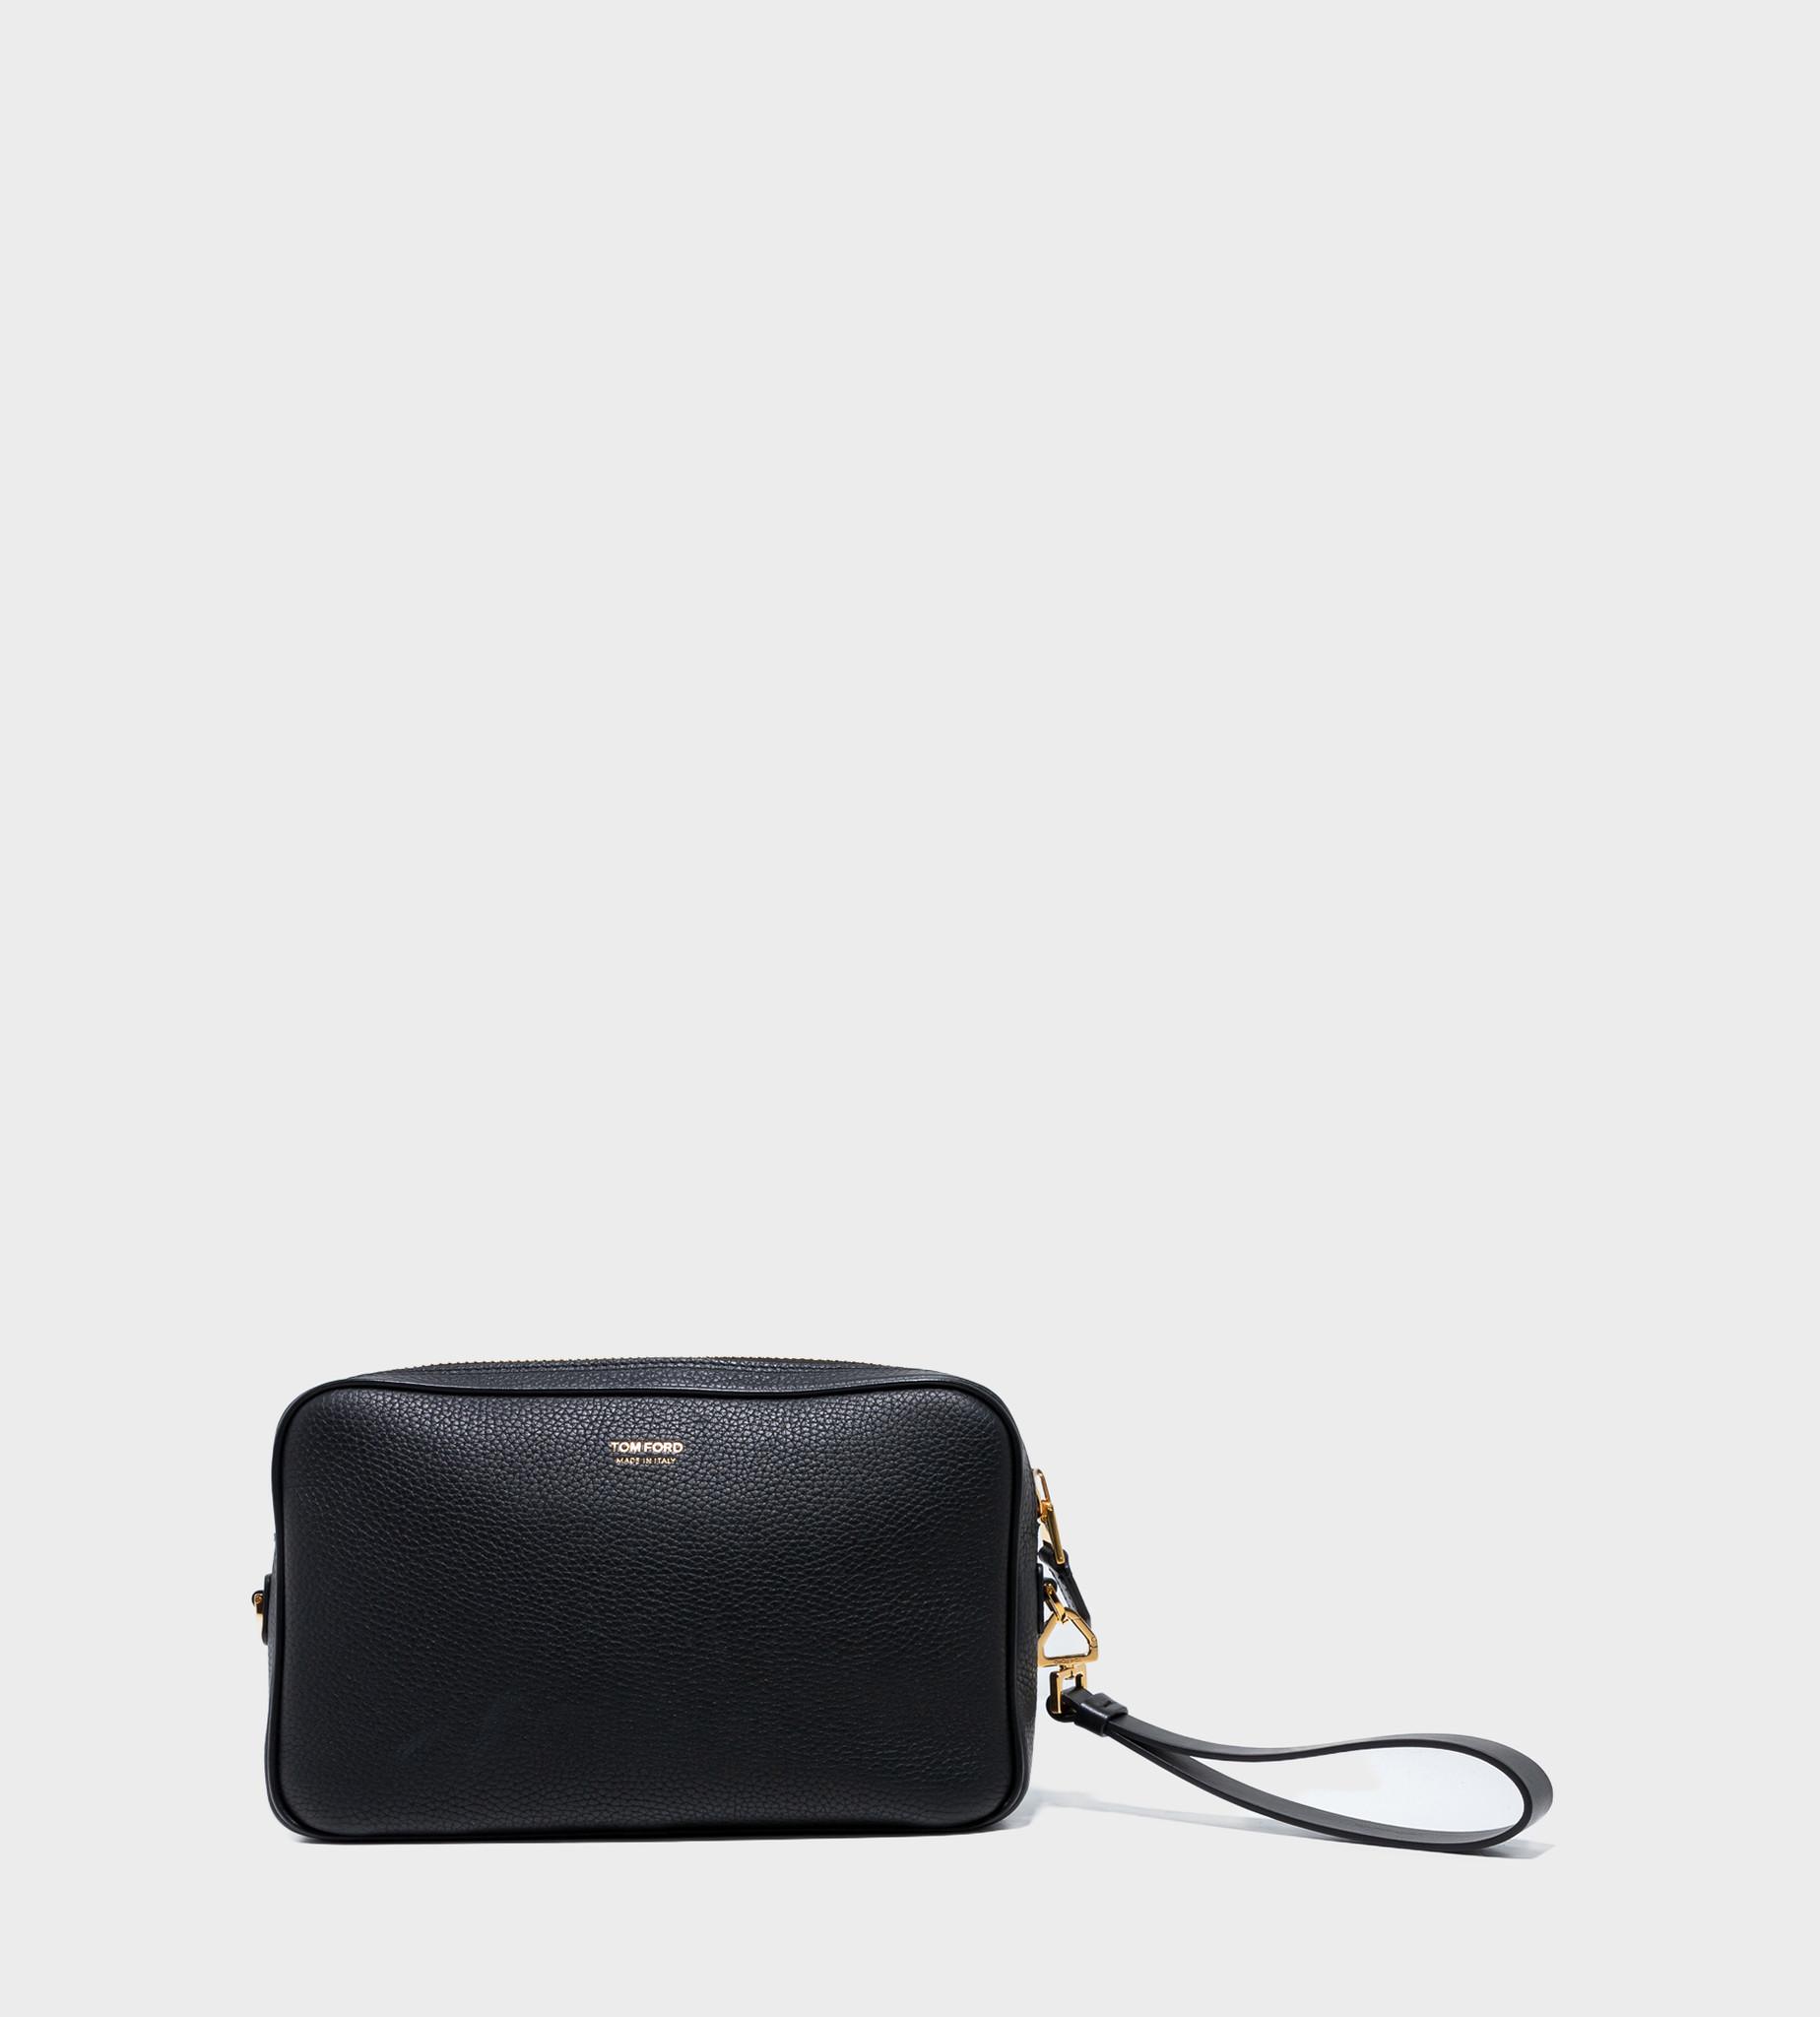 TOM FORD Logo Print Wash Bag Black